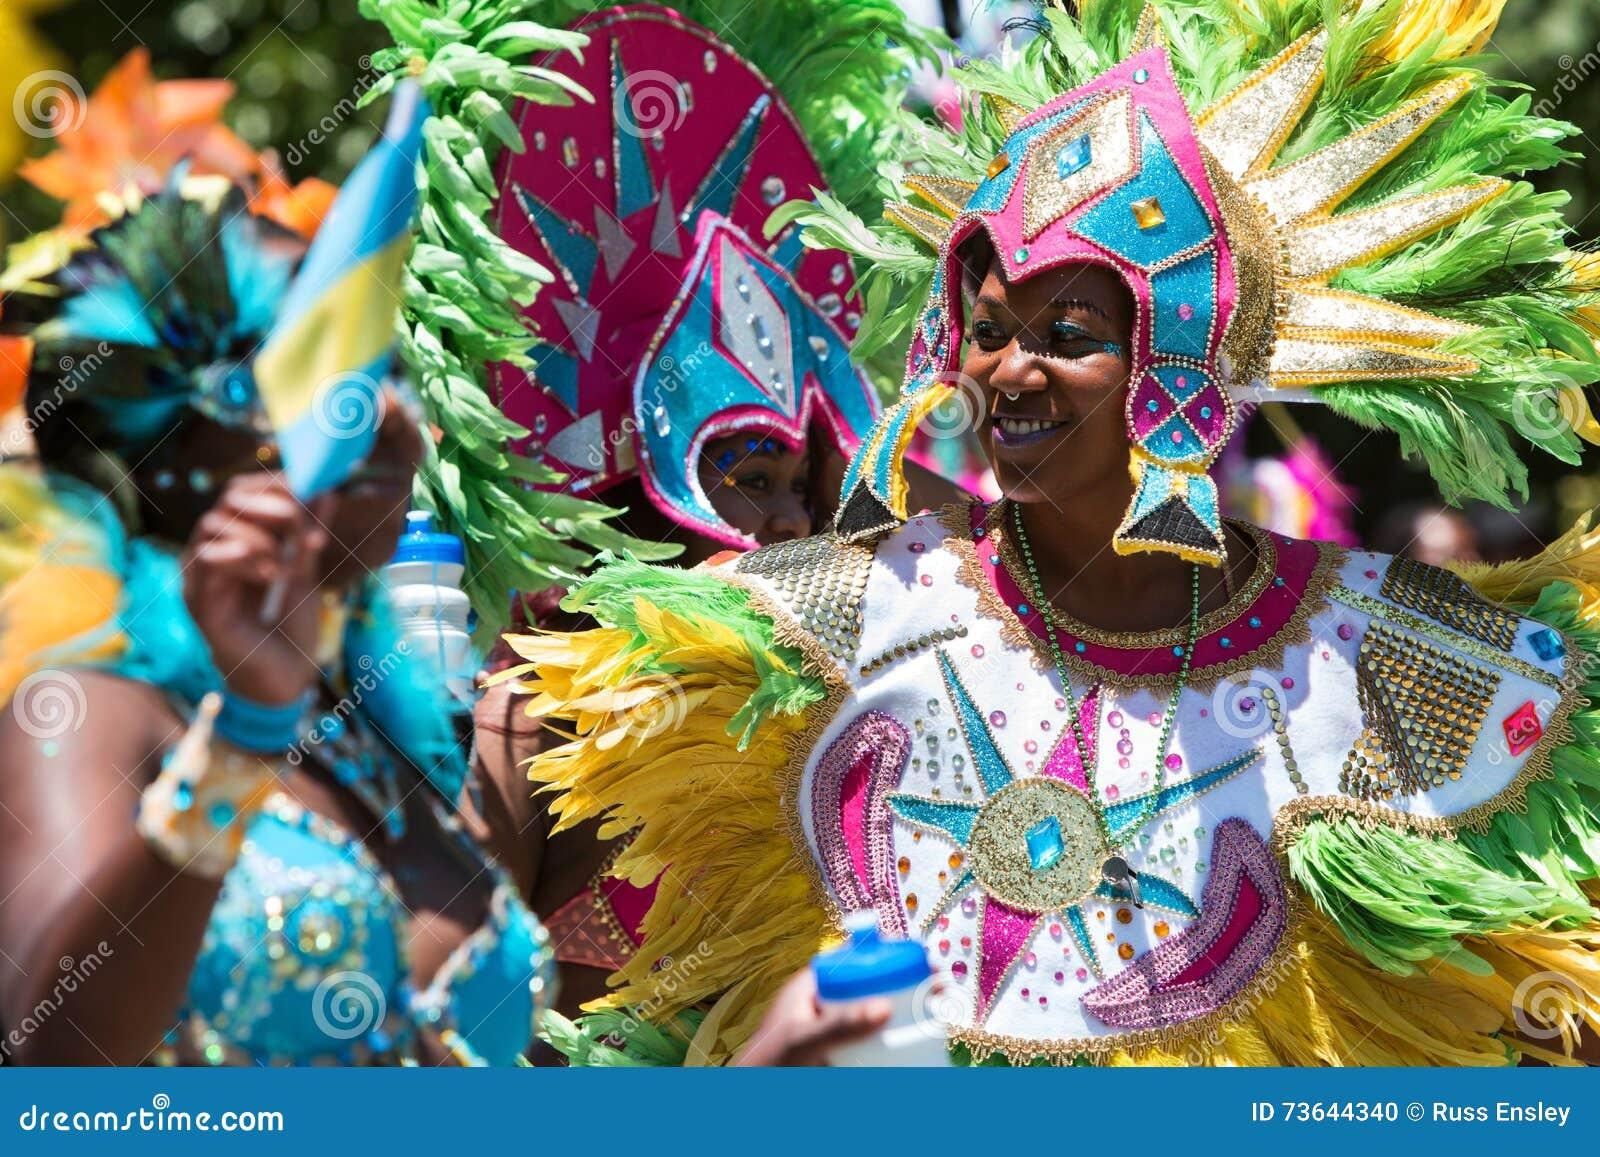 Caribbean Culture: Women Wearing Elaborate Feathered Costumes Celebrate